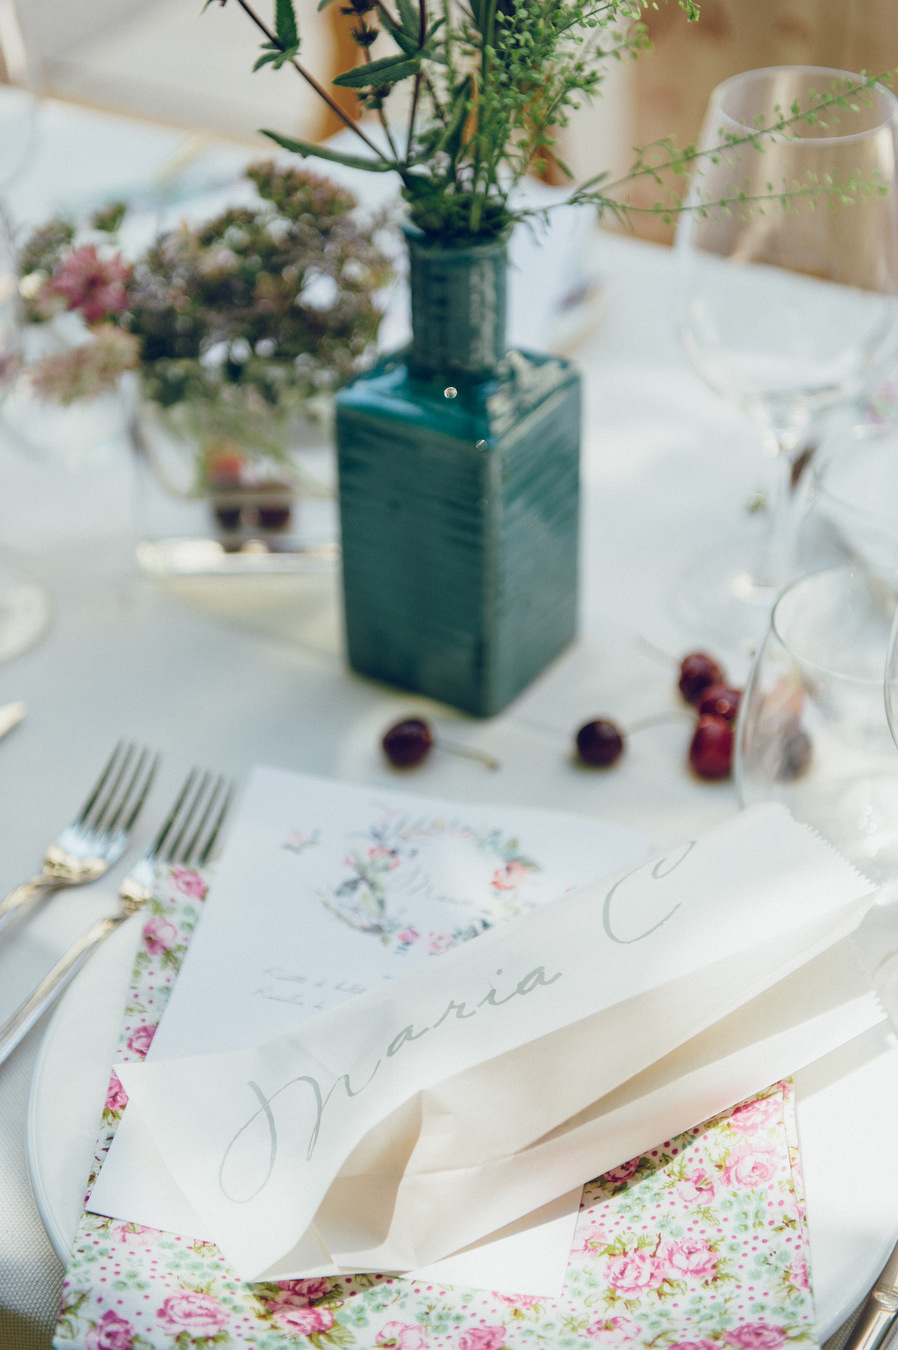 calista-one-lista-de-bodas-online-blog-de-bodas-calista-one-summer-party-2016-wedding-planner-dpleis-4